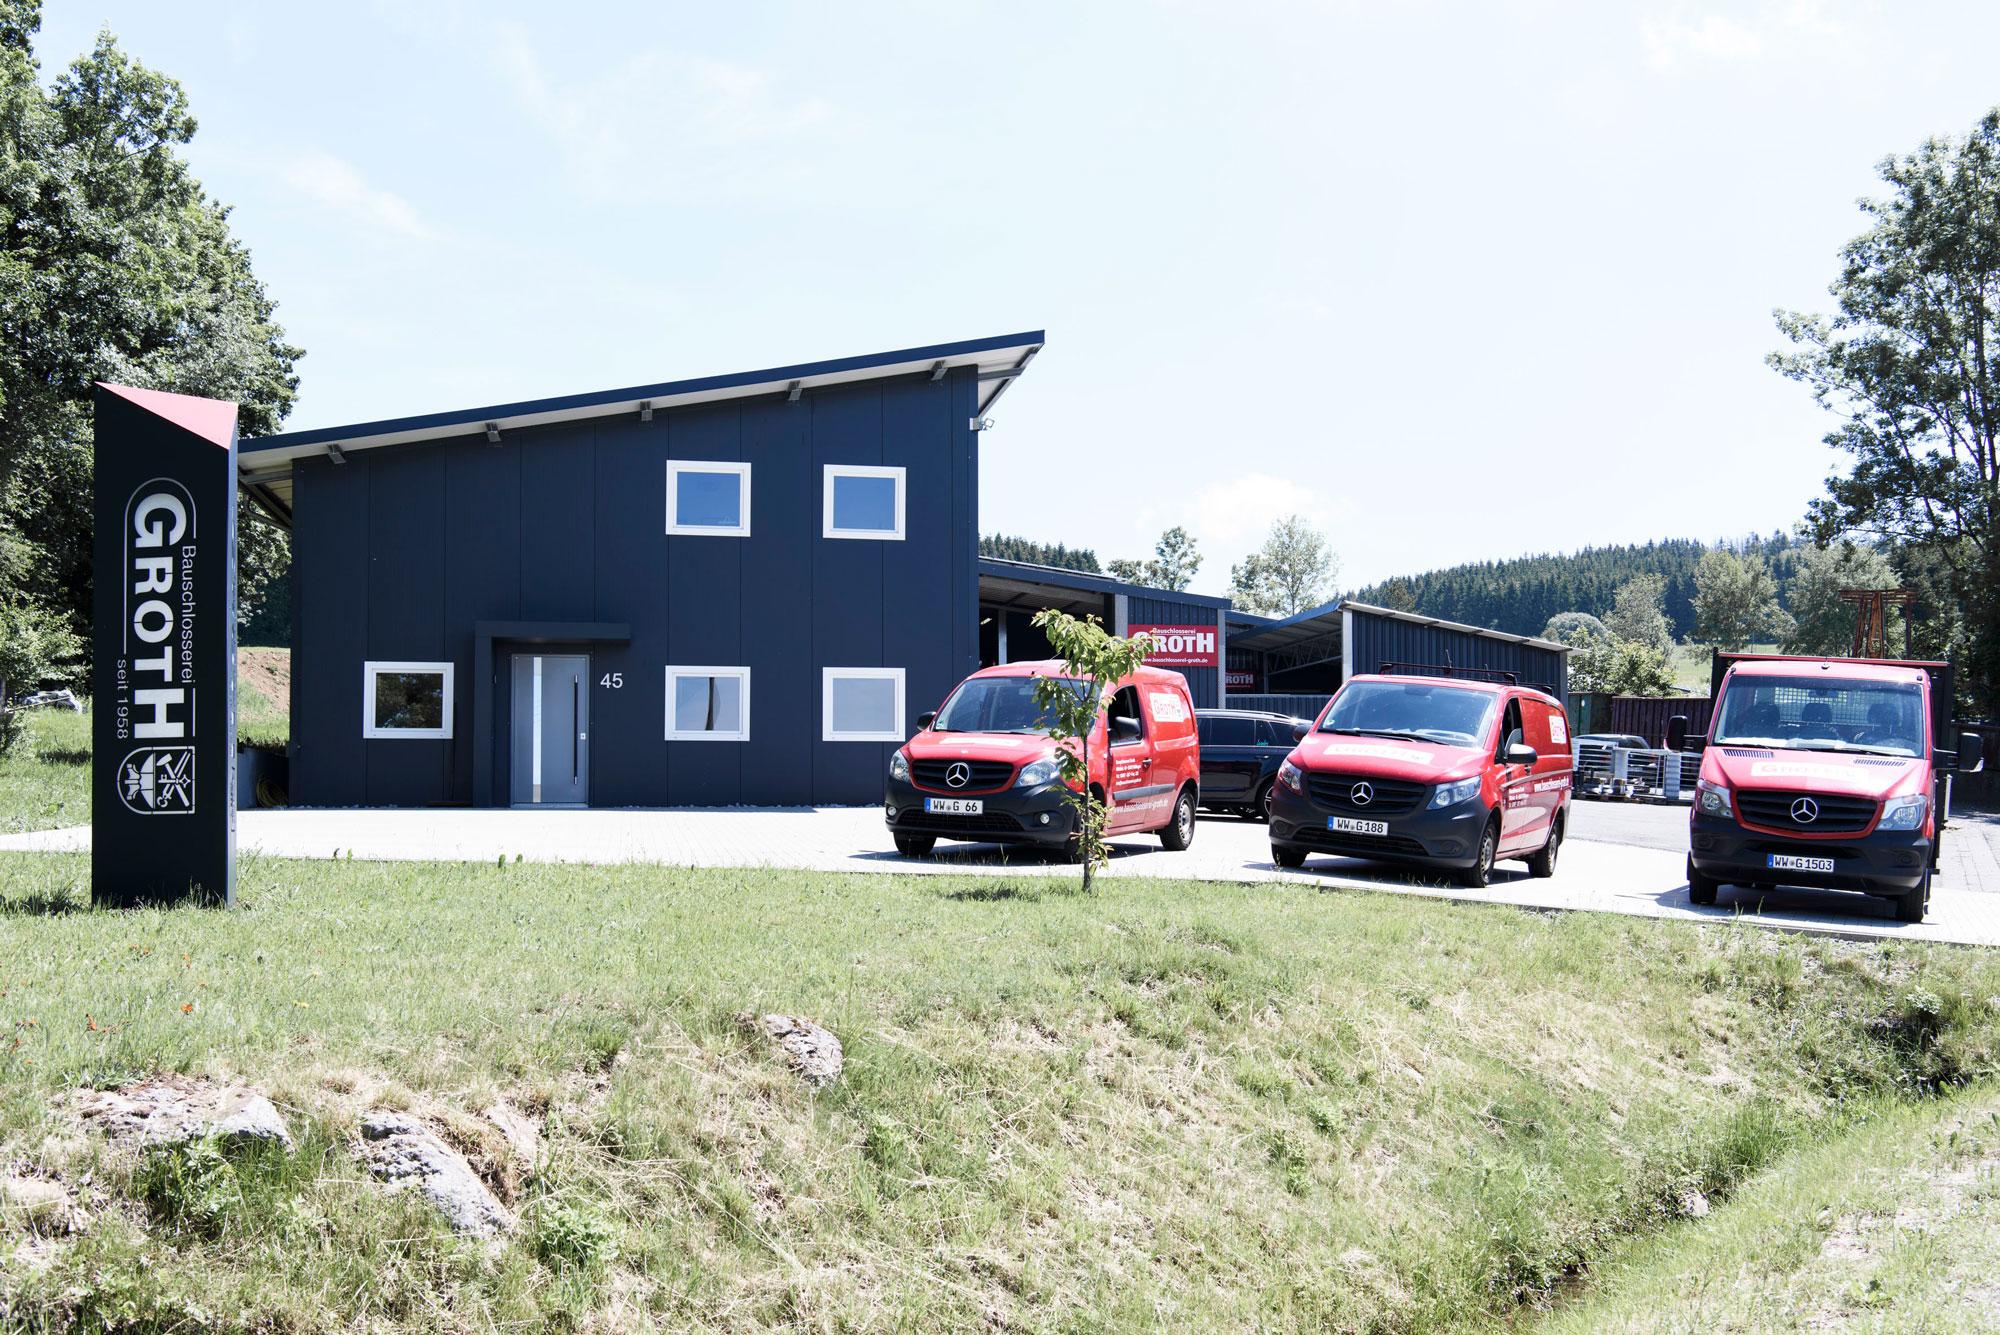 Bauschlosserei-Groth-in-Willingen